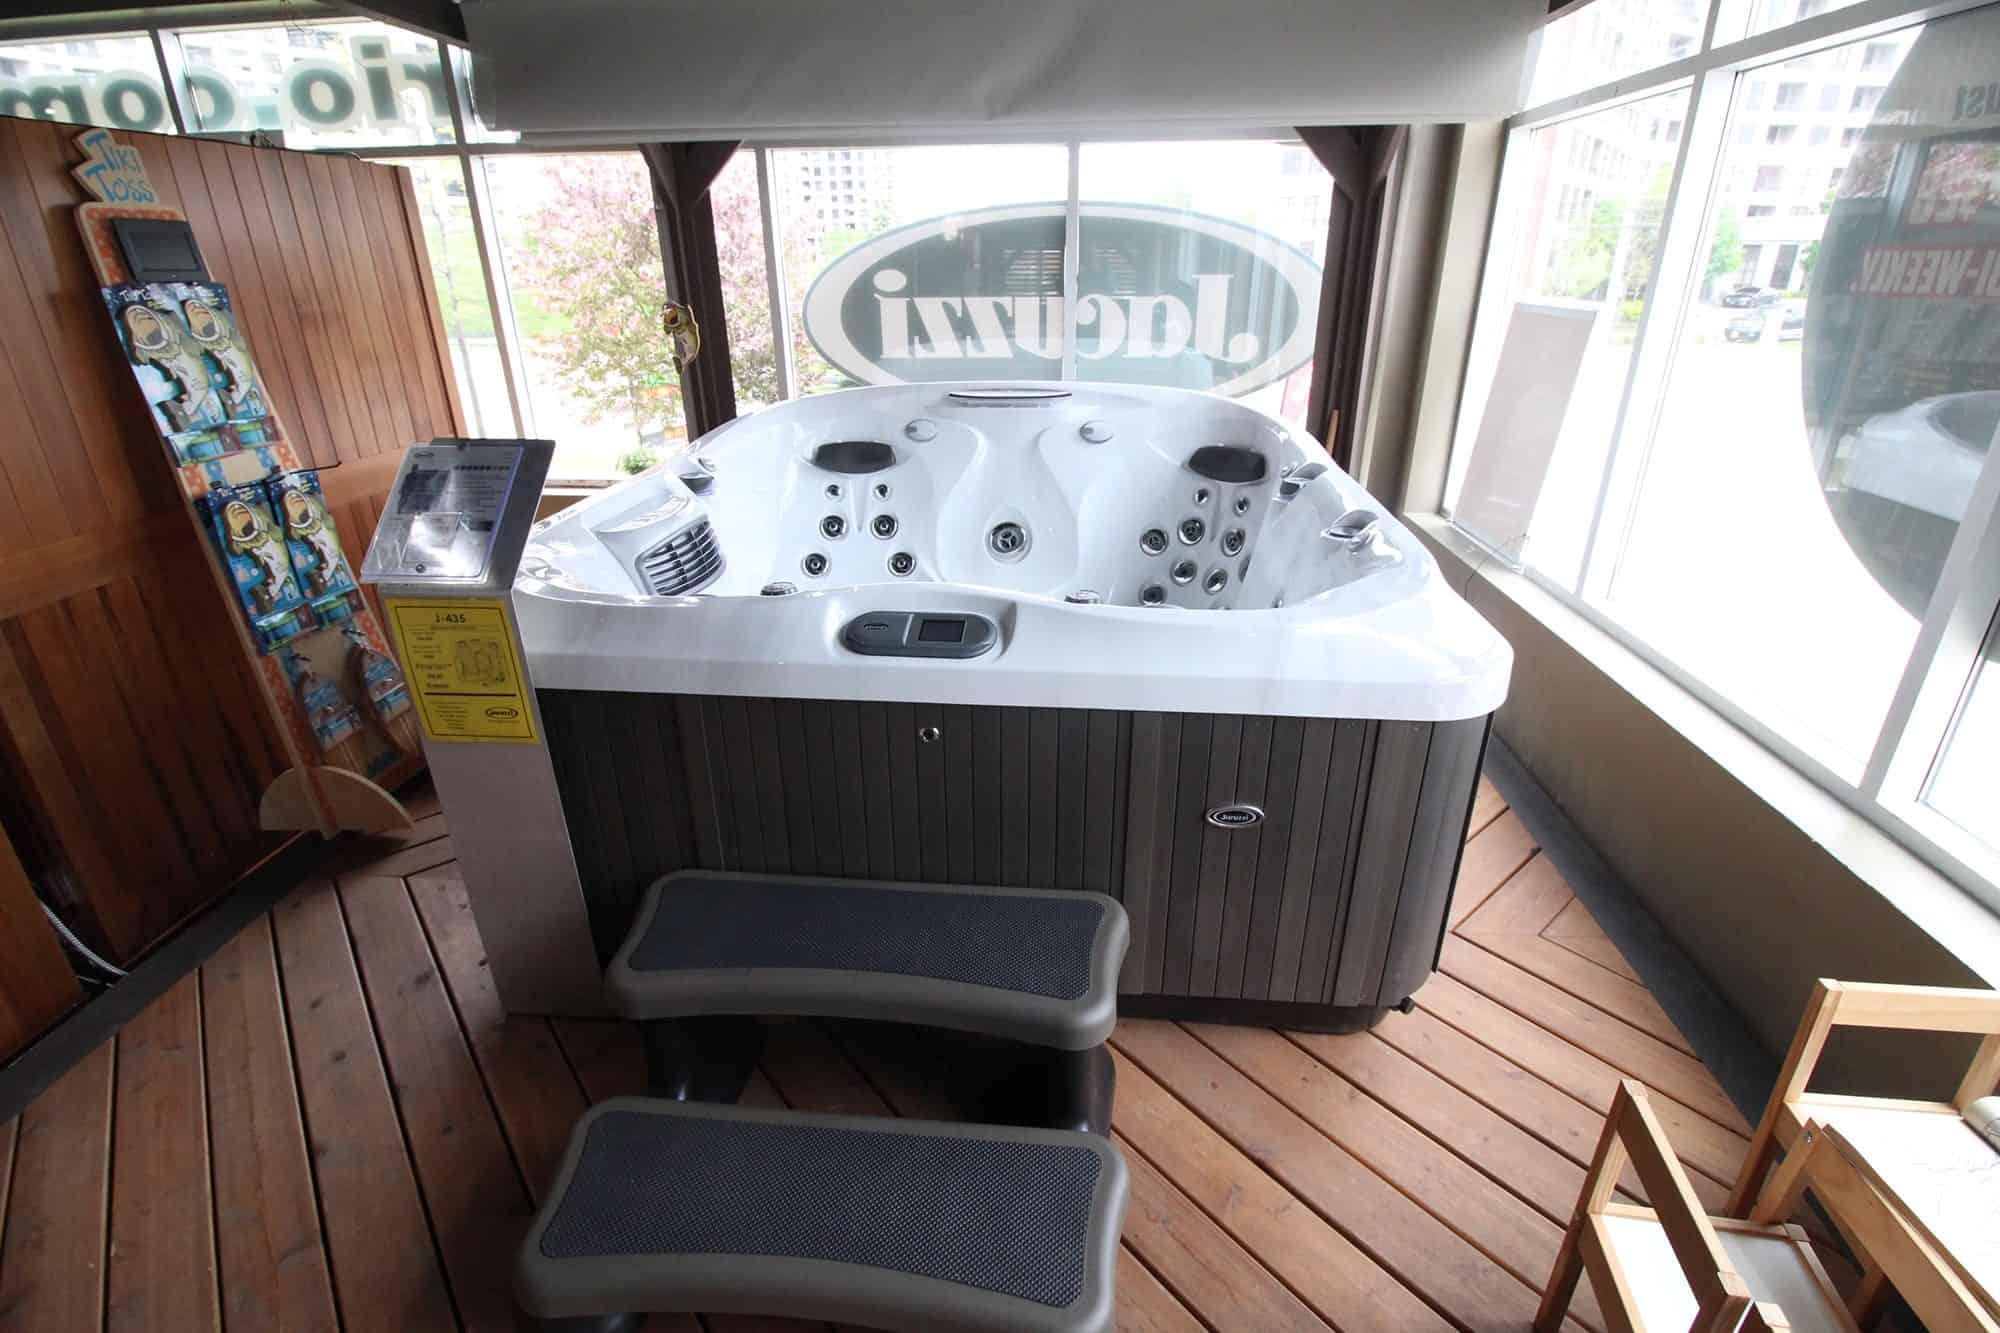 Jacuzzi Vaughan hot tub showroom